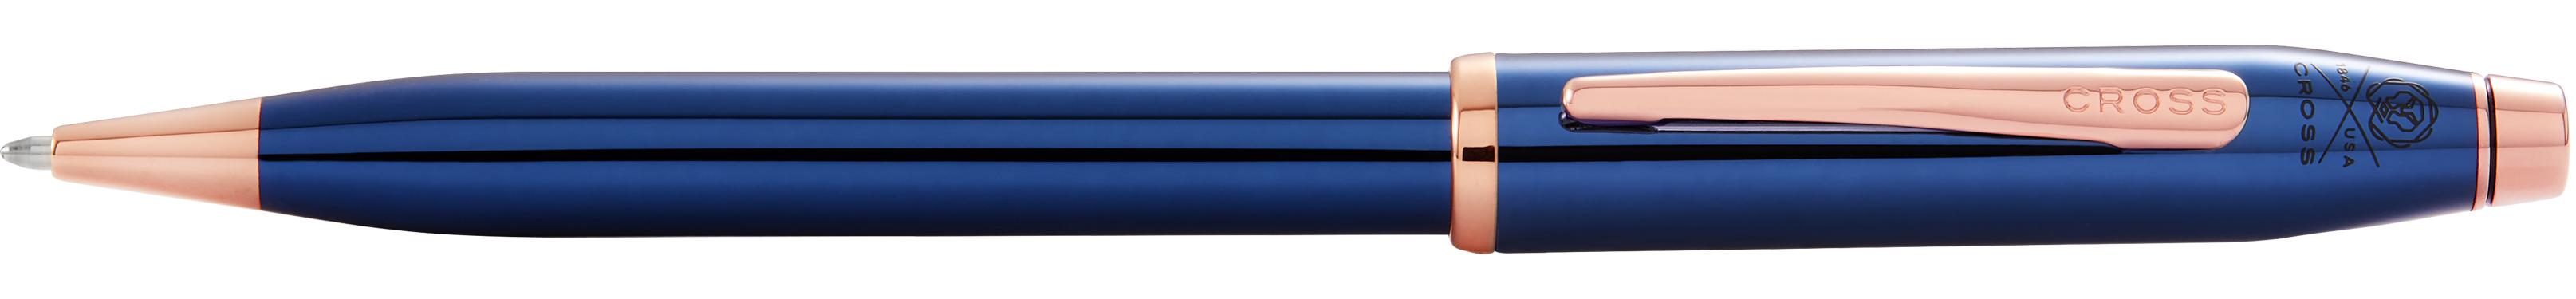 Century II Translucent Cobalt Blue Lacquer Ballpoint Pen